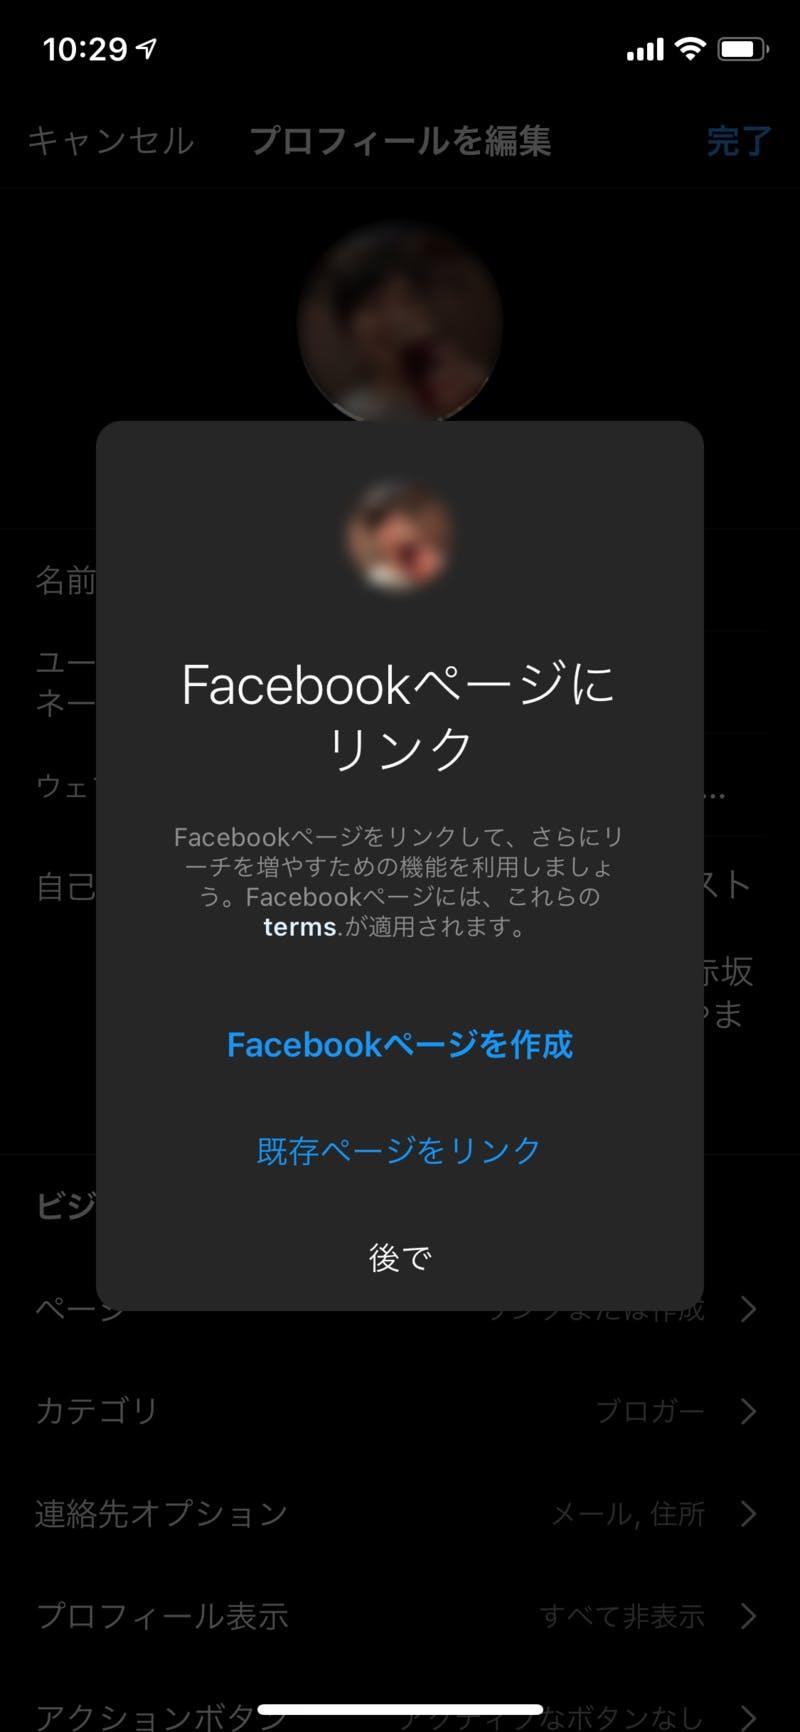 InstagramとFacebookの連携手順画面3(Instagramビジネスアカウントから)